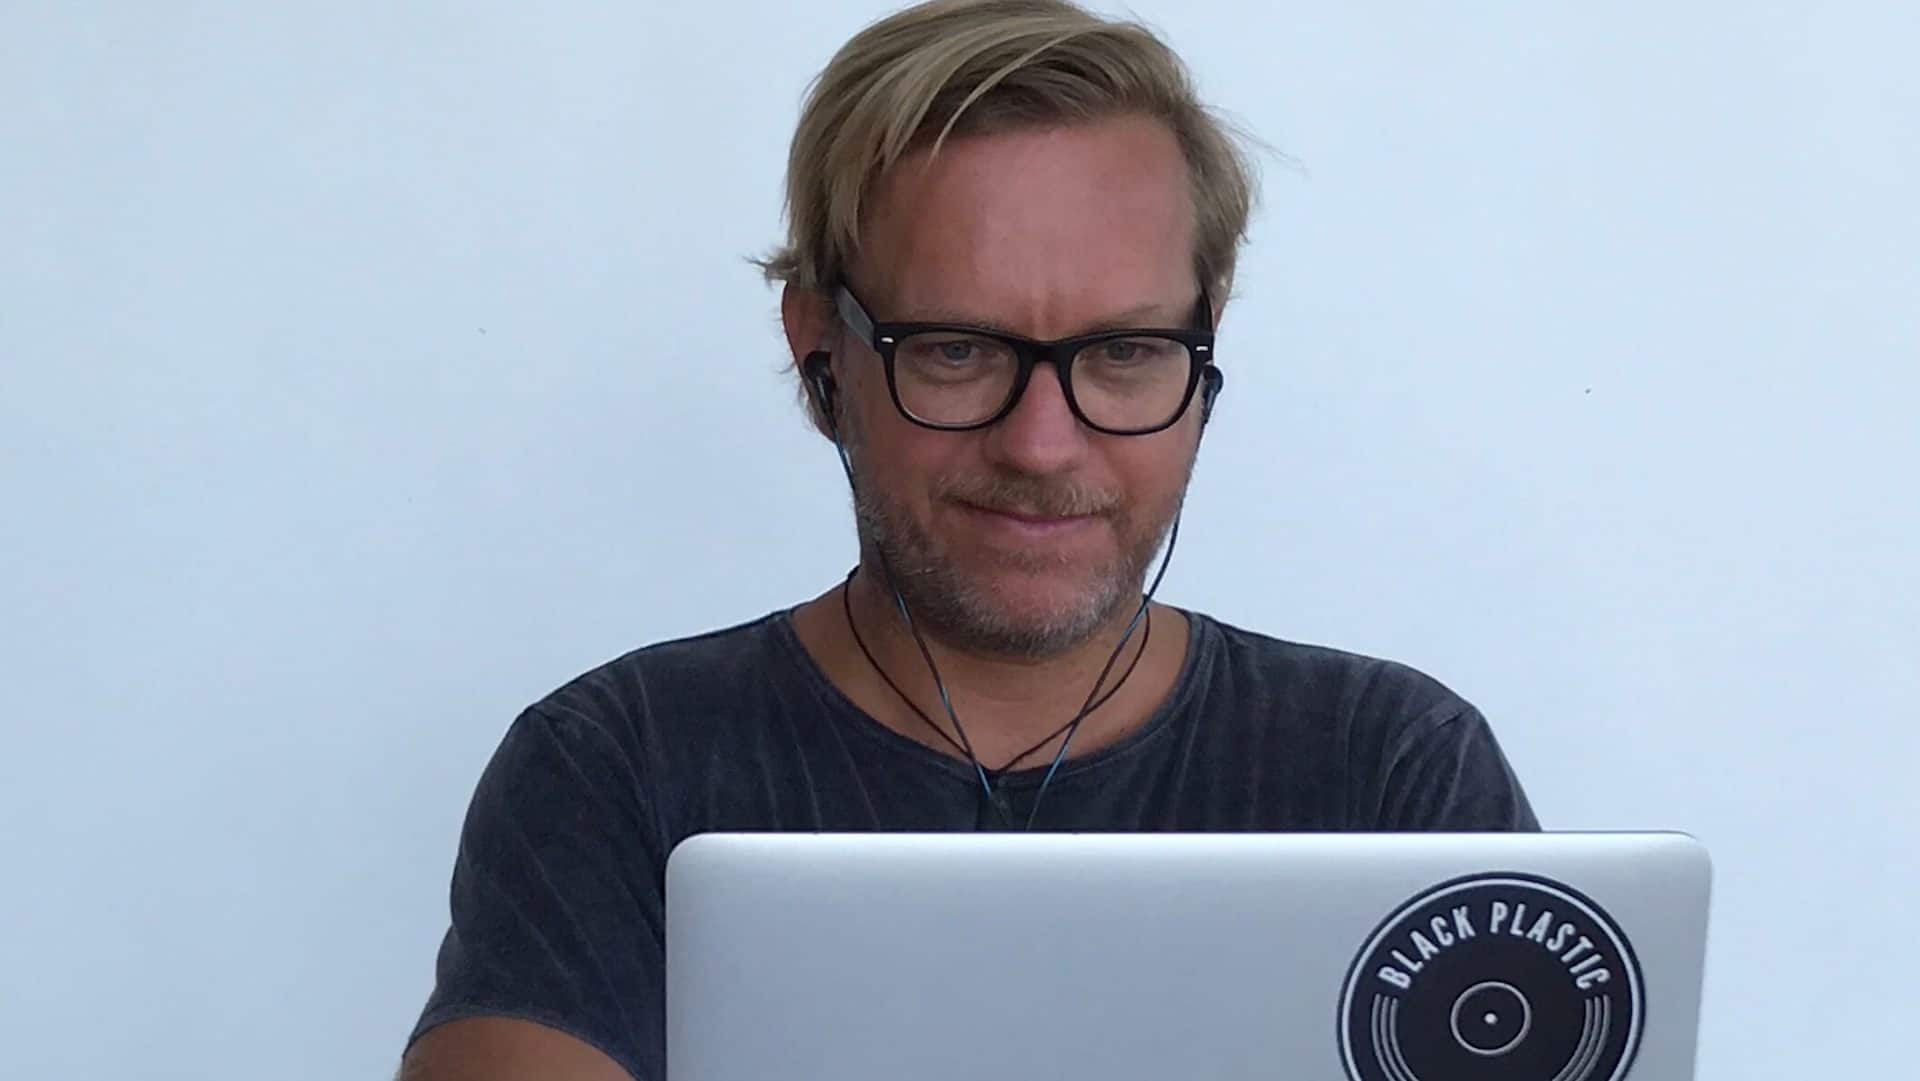 Lars Kleining am Computer